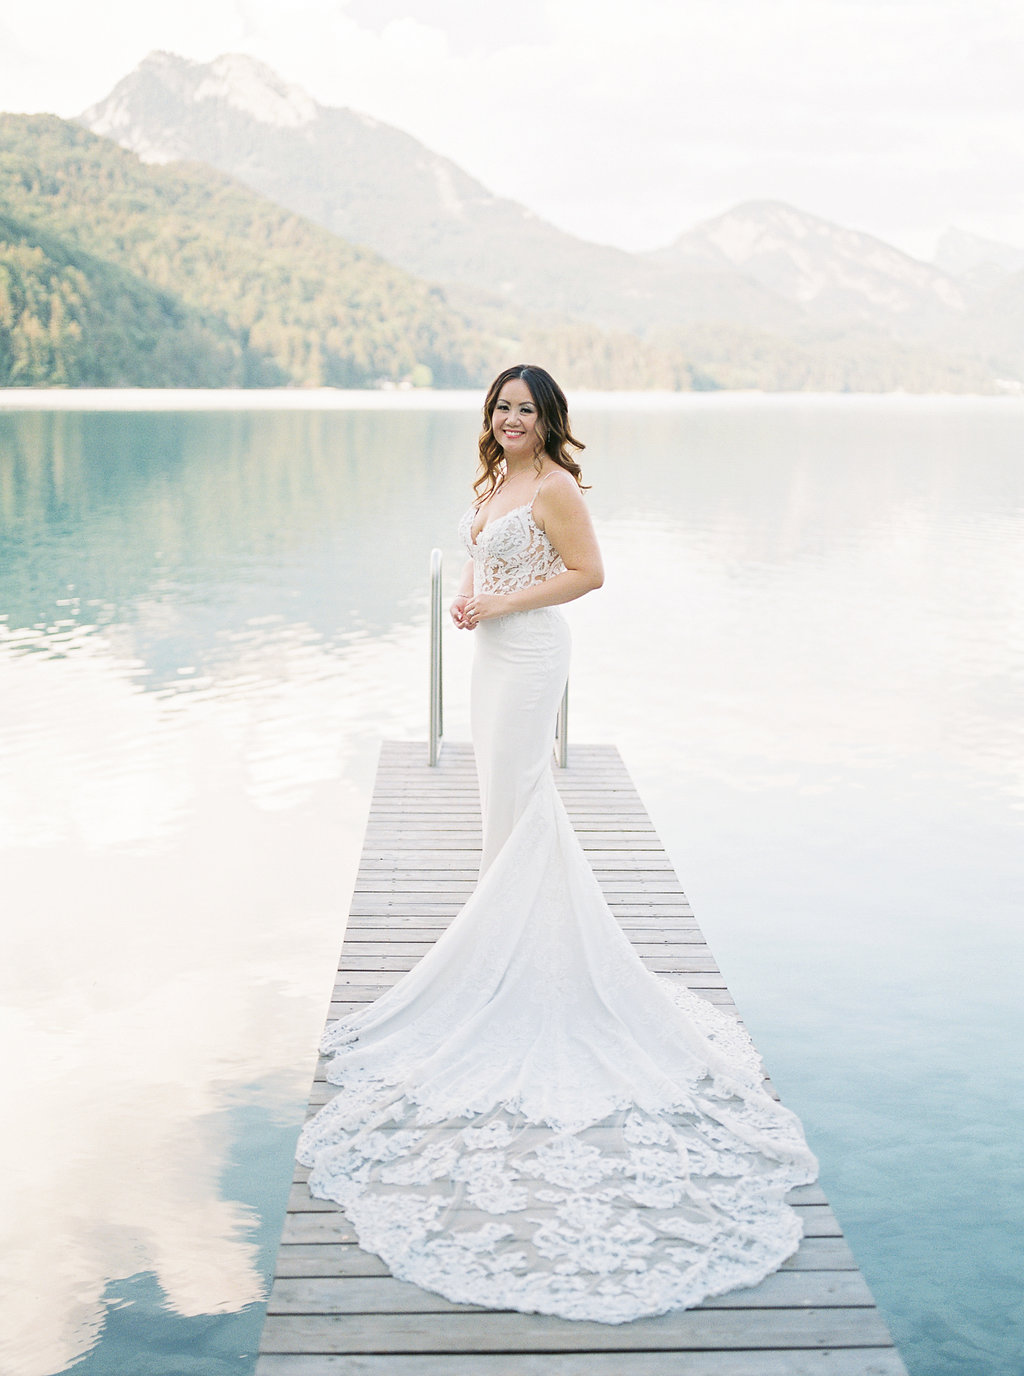 Luxe Navy and Pink Wedding at Schloss Fuschl in Austria by Tanja Kibogo16.JPG